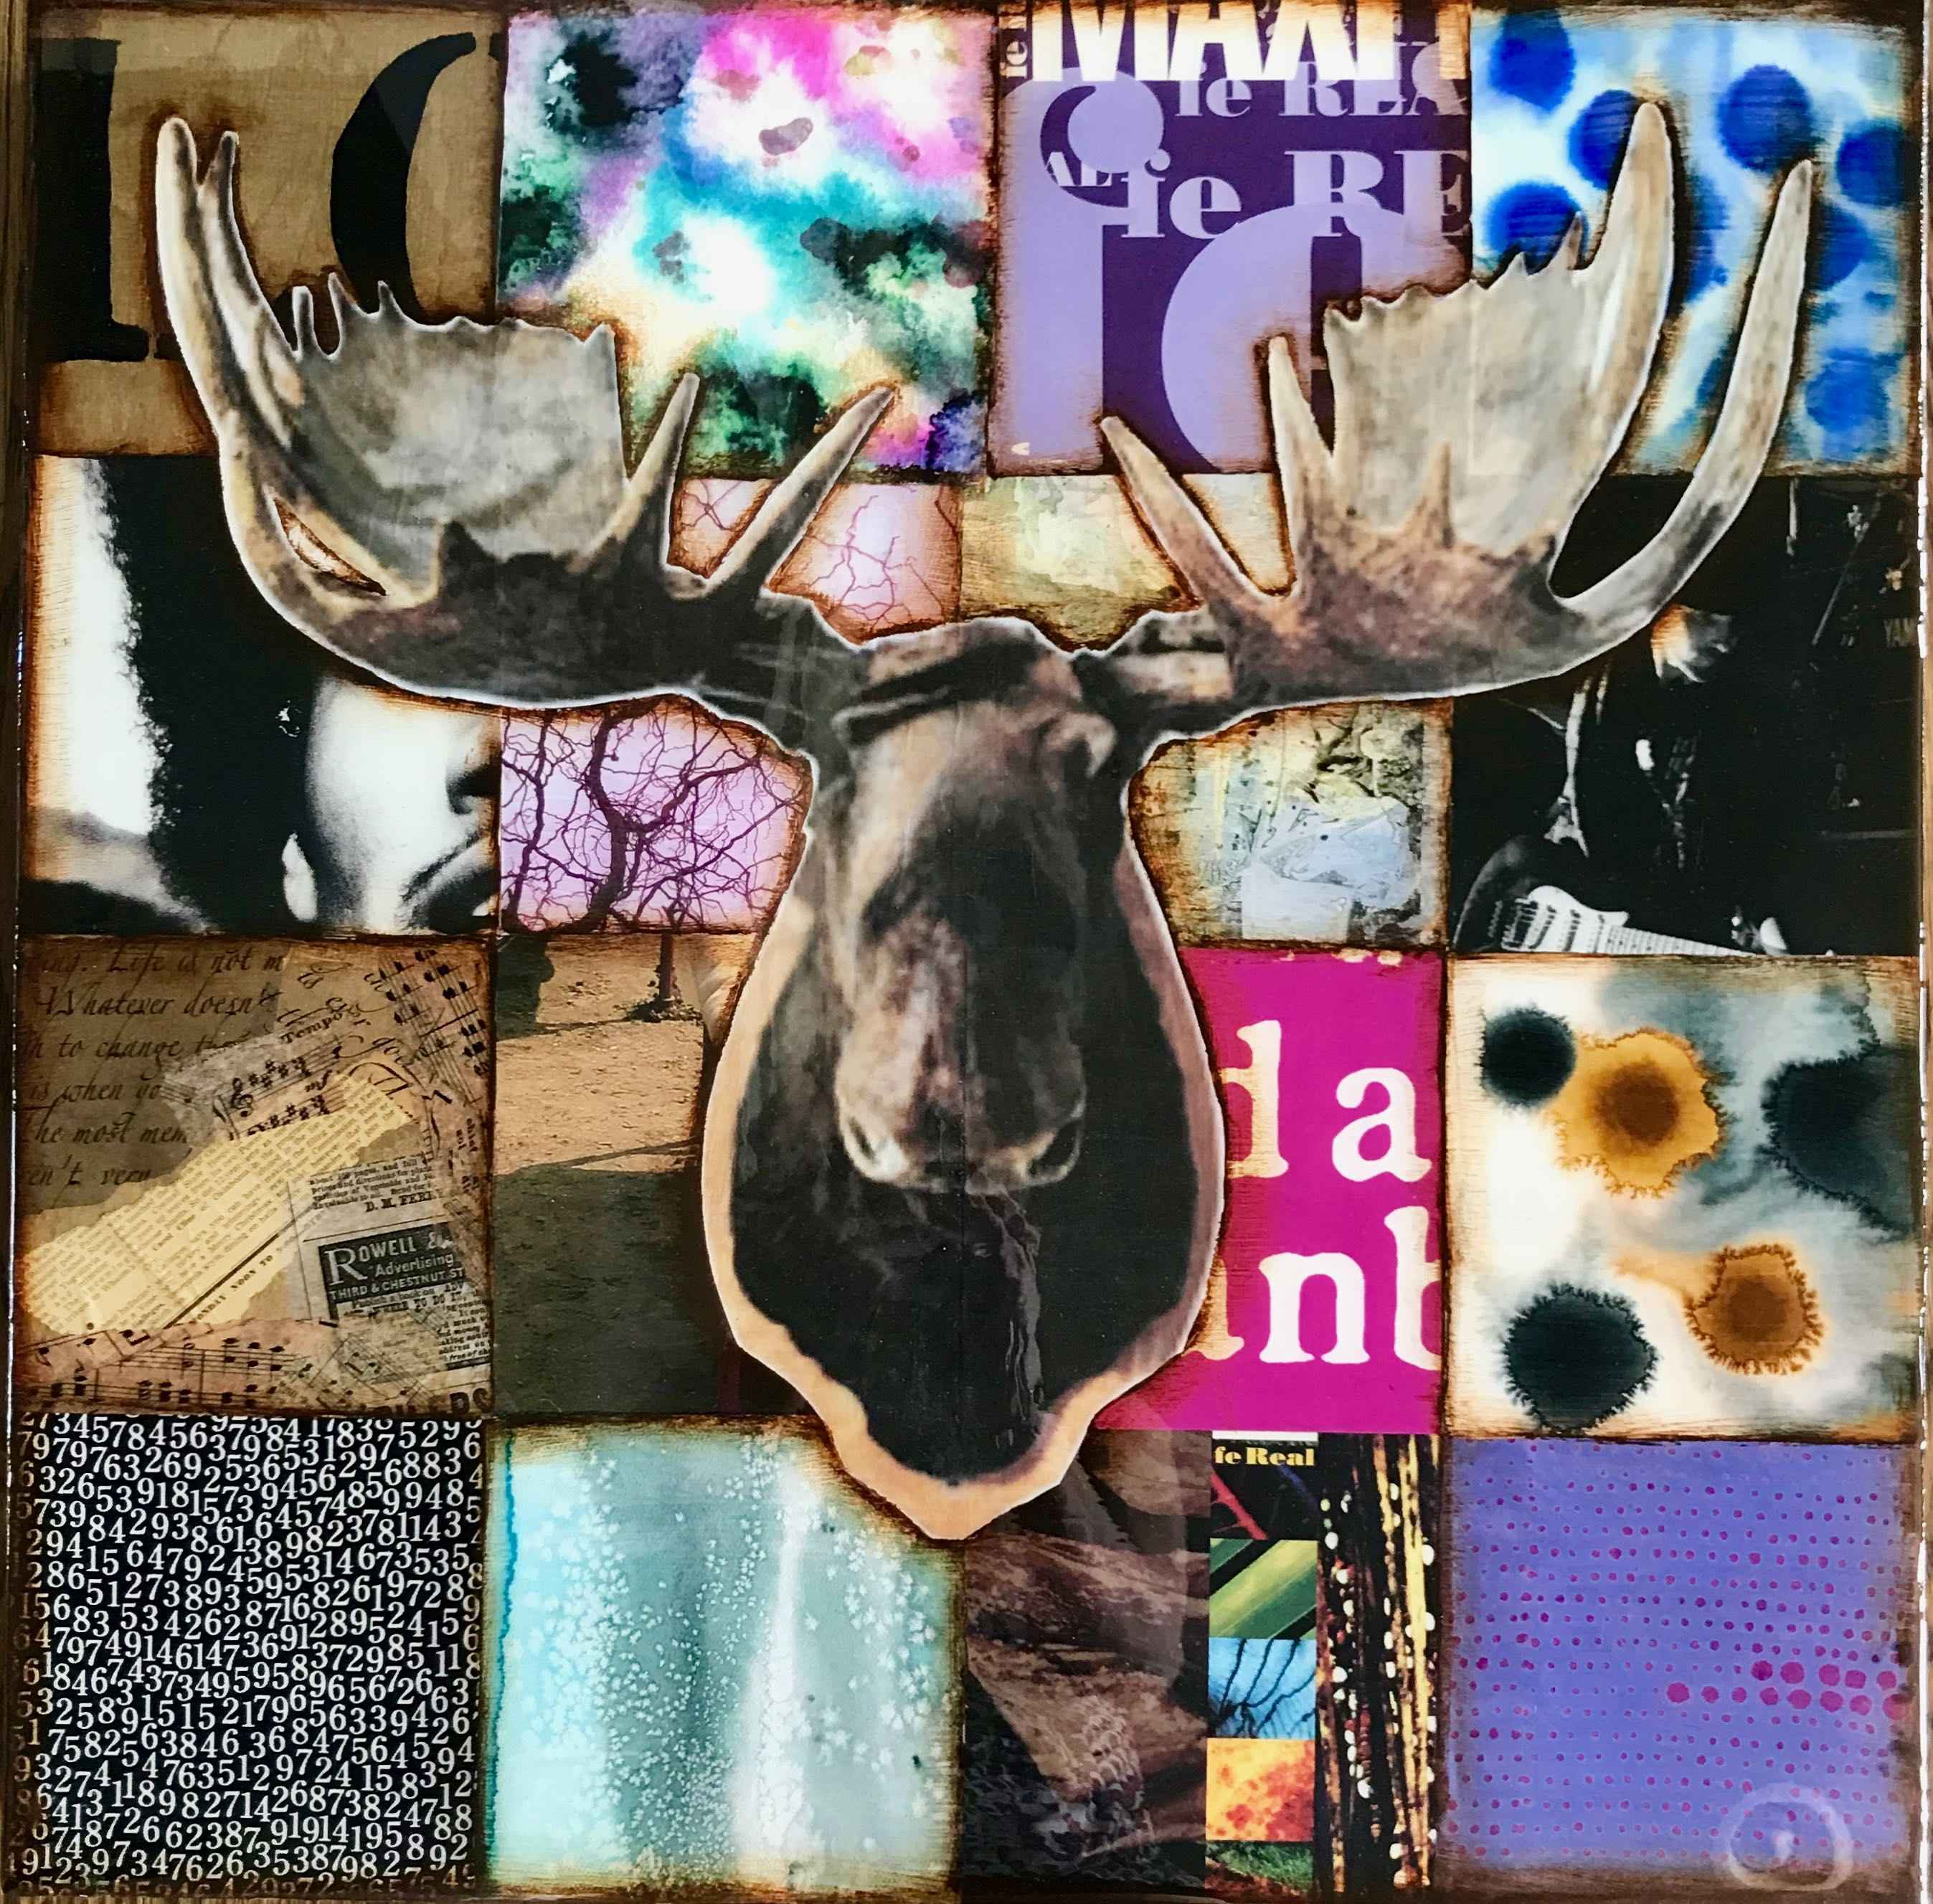 Jimi the Moose